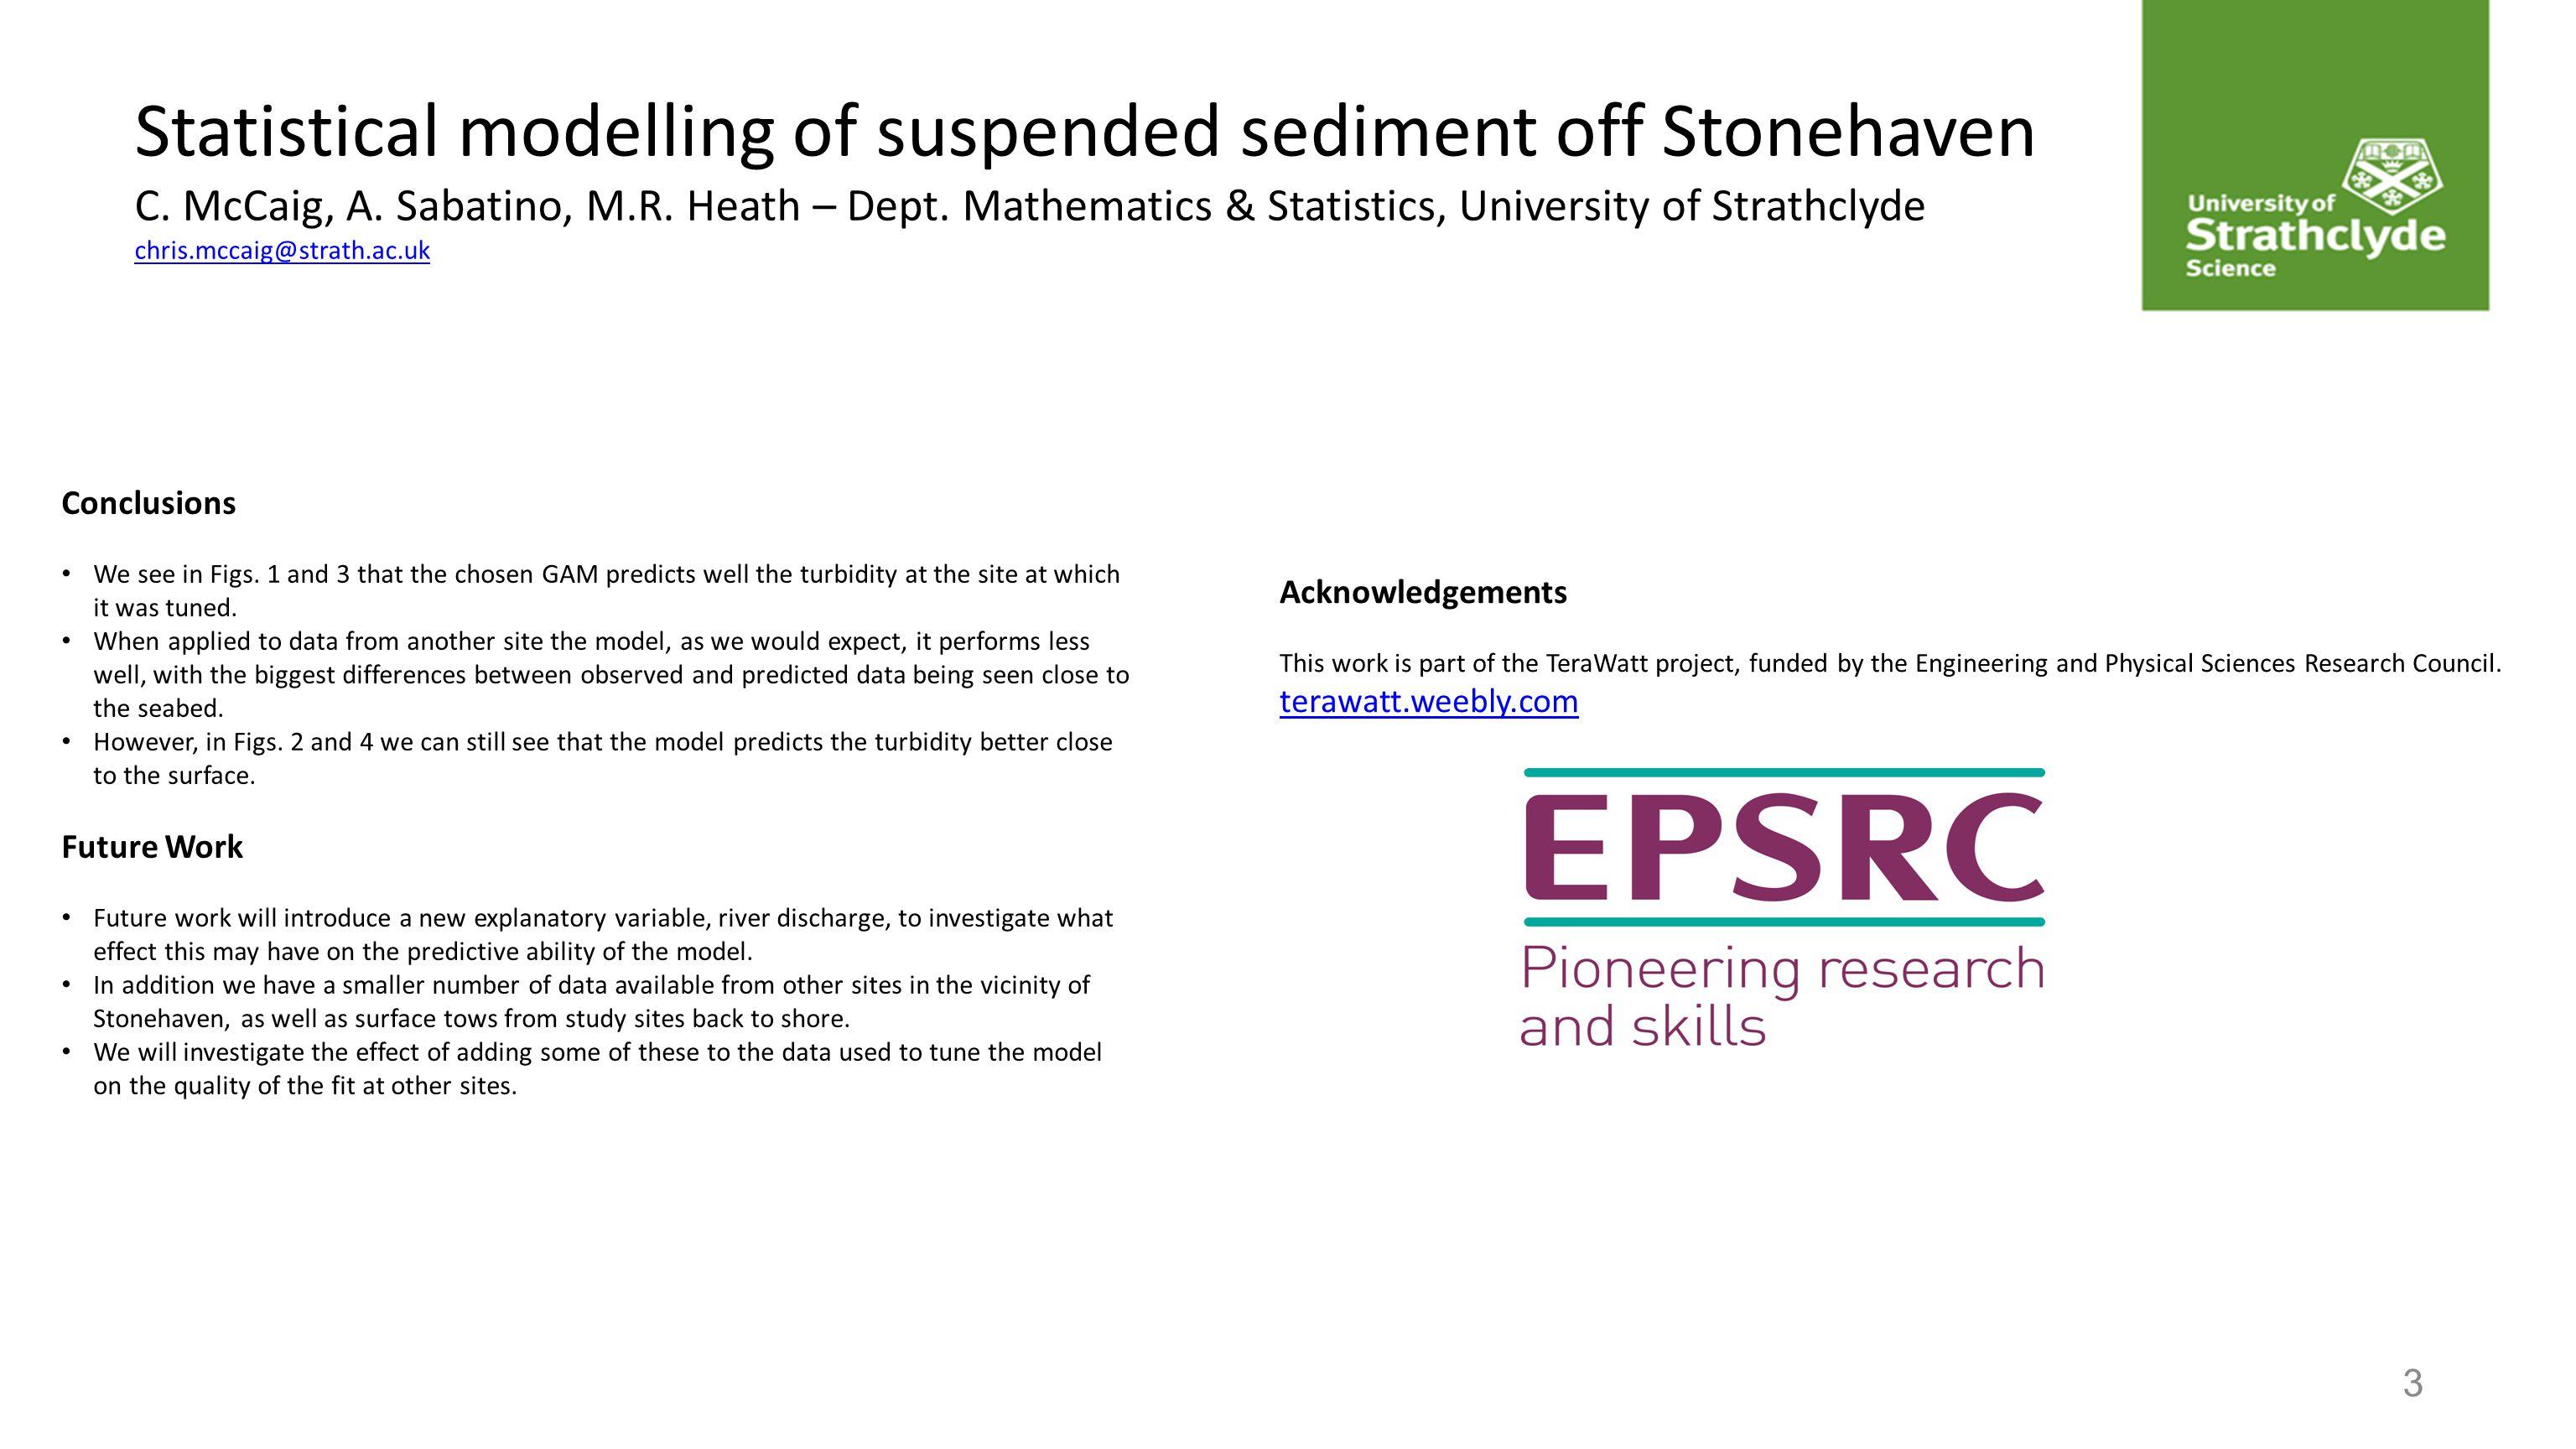 Statistical modelling of suspended sediment off Stonehaven C. McCaig, A. Sabatino, M.R. Heath – Dept. Mathematics & Statistics, University of Strathcl